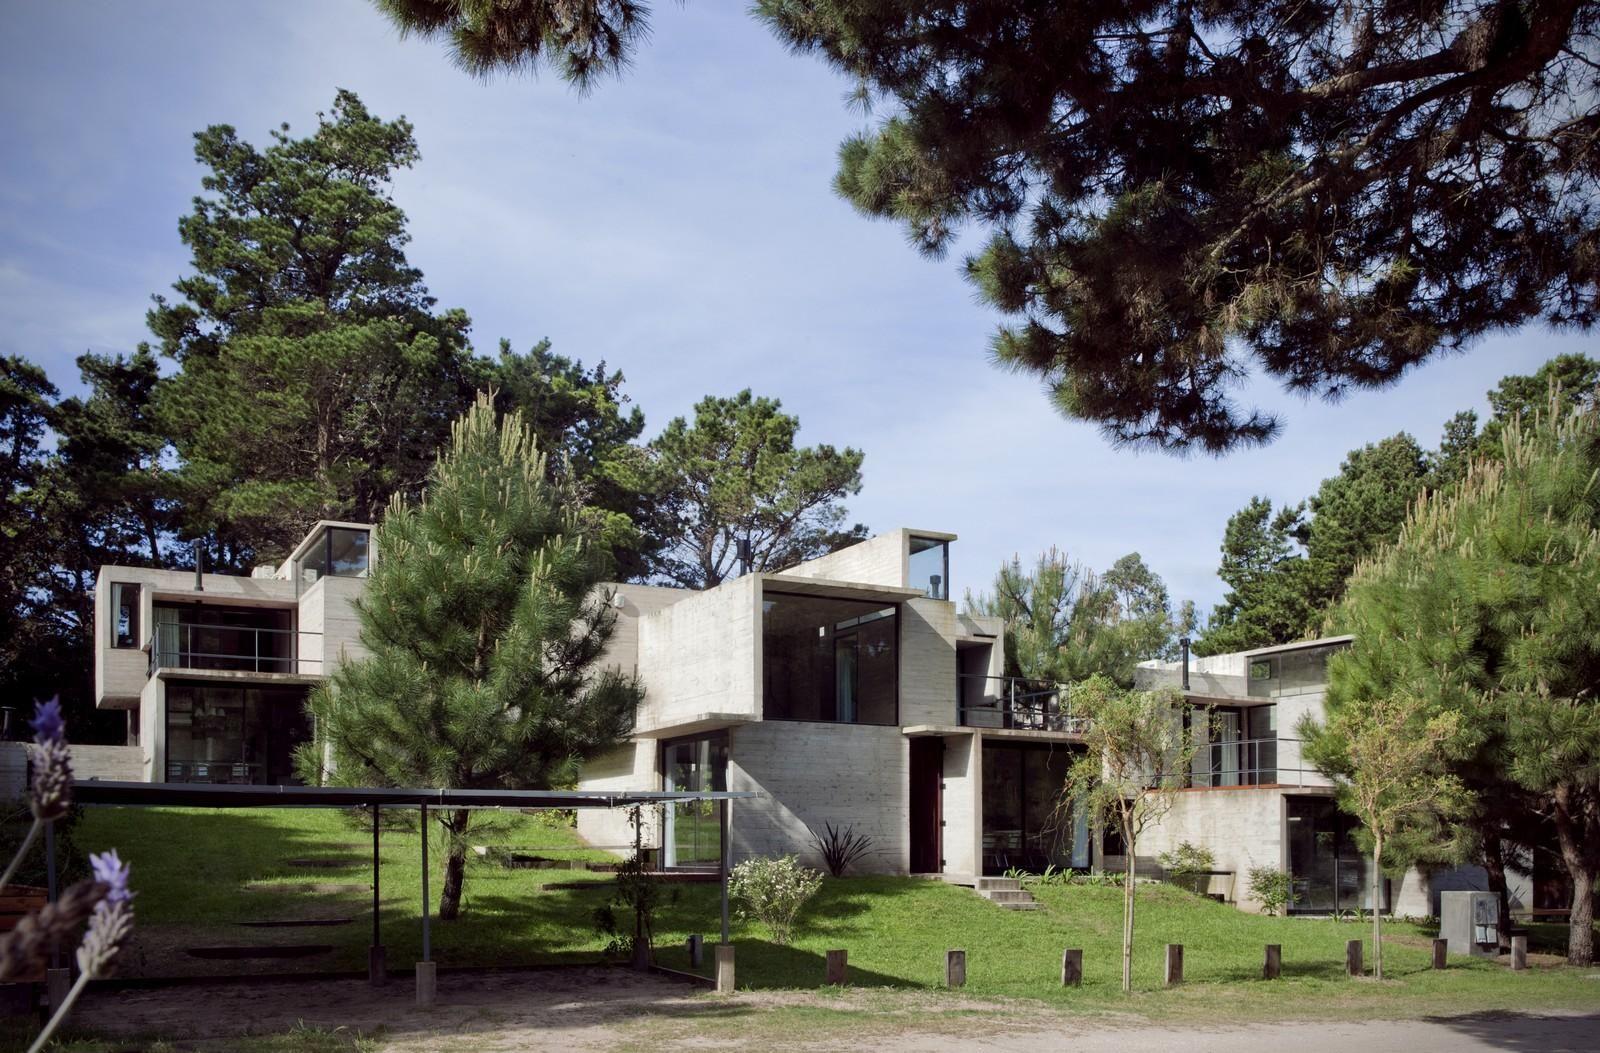 V+D SET by BAK Arquitectos, Mar Azul, Villa Gesell, Buenos Aires Province, Argentina